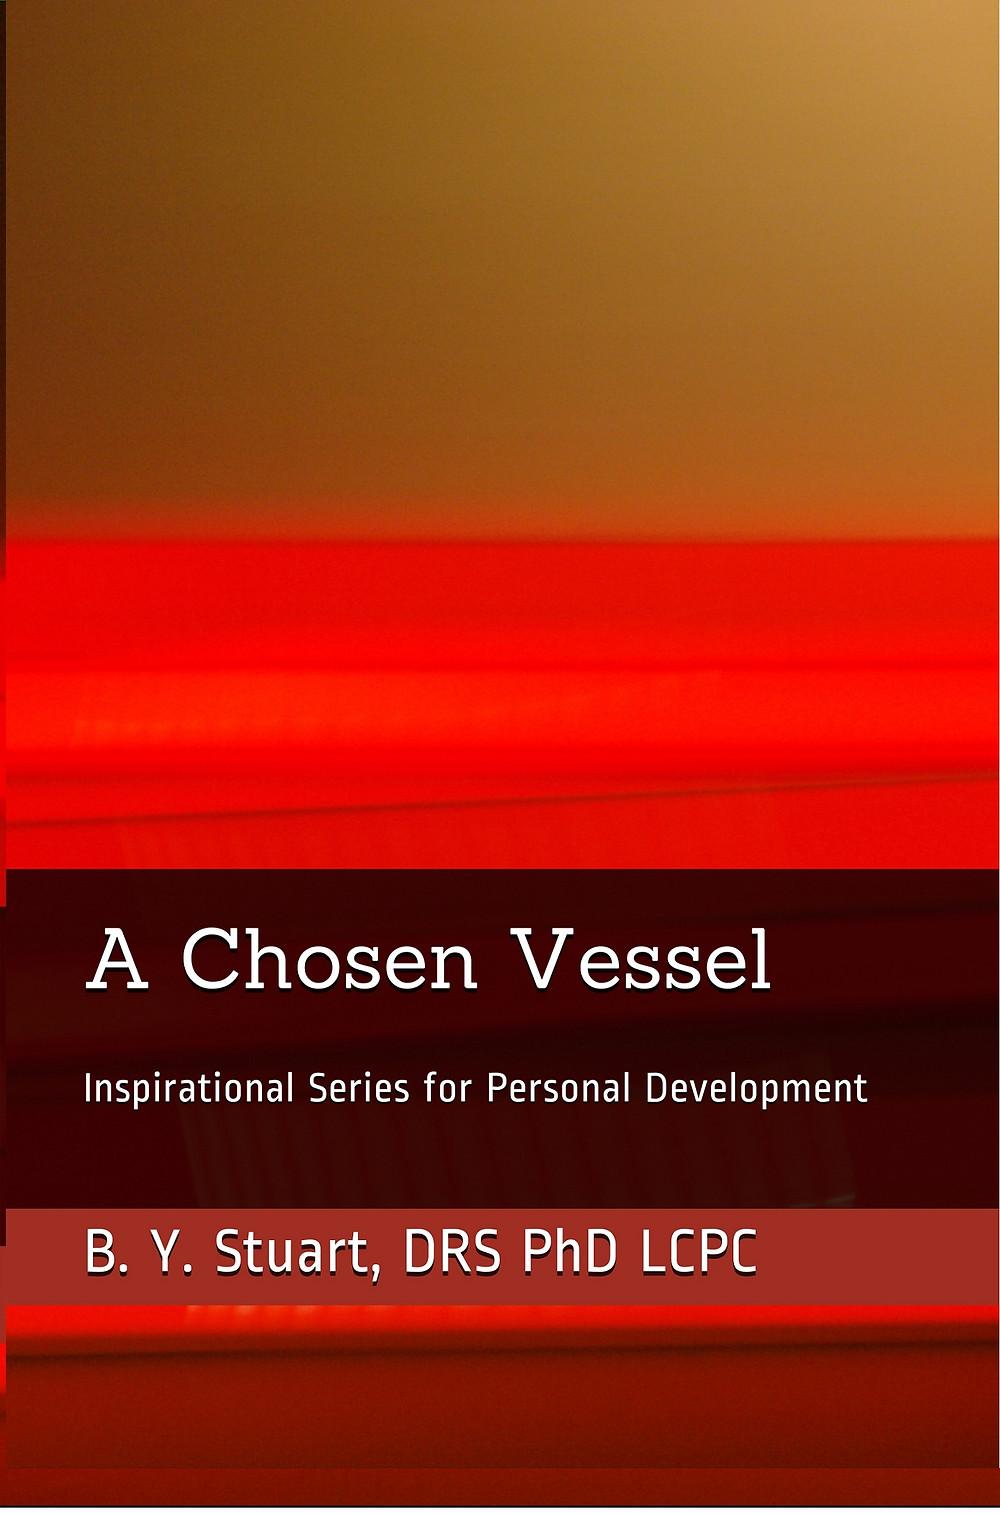 A Chosen Vessel